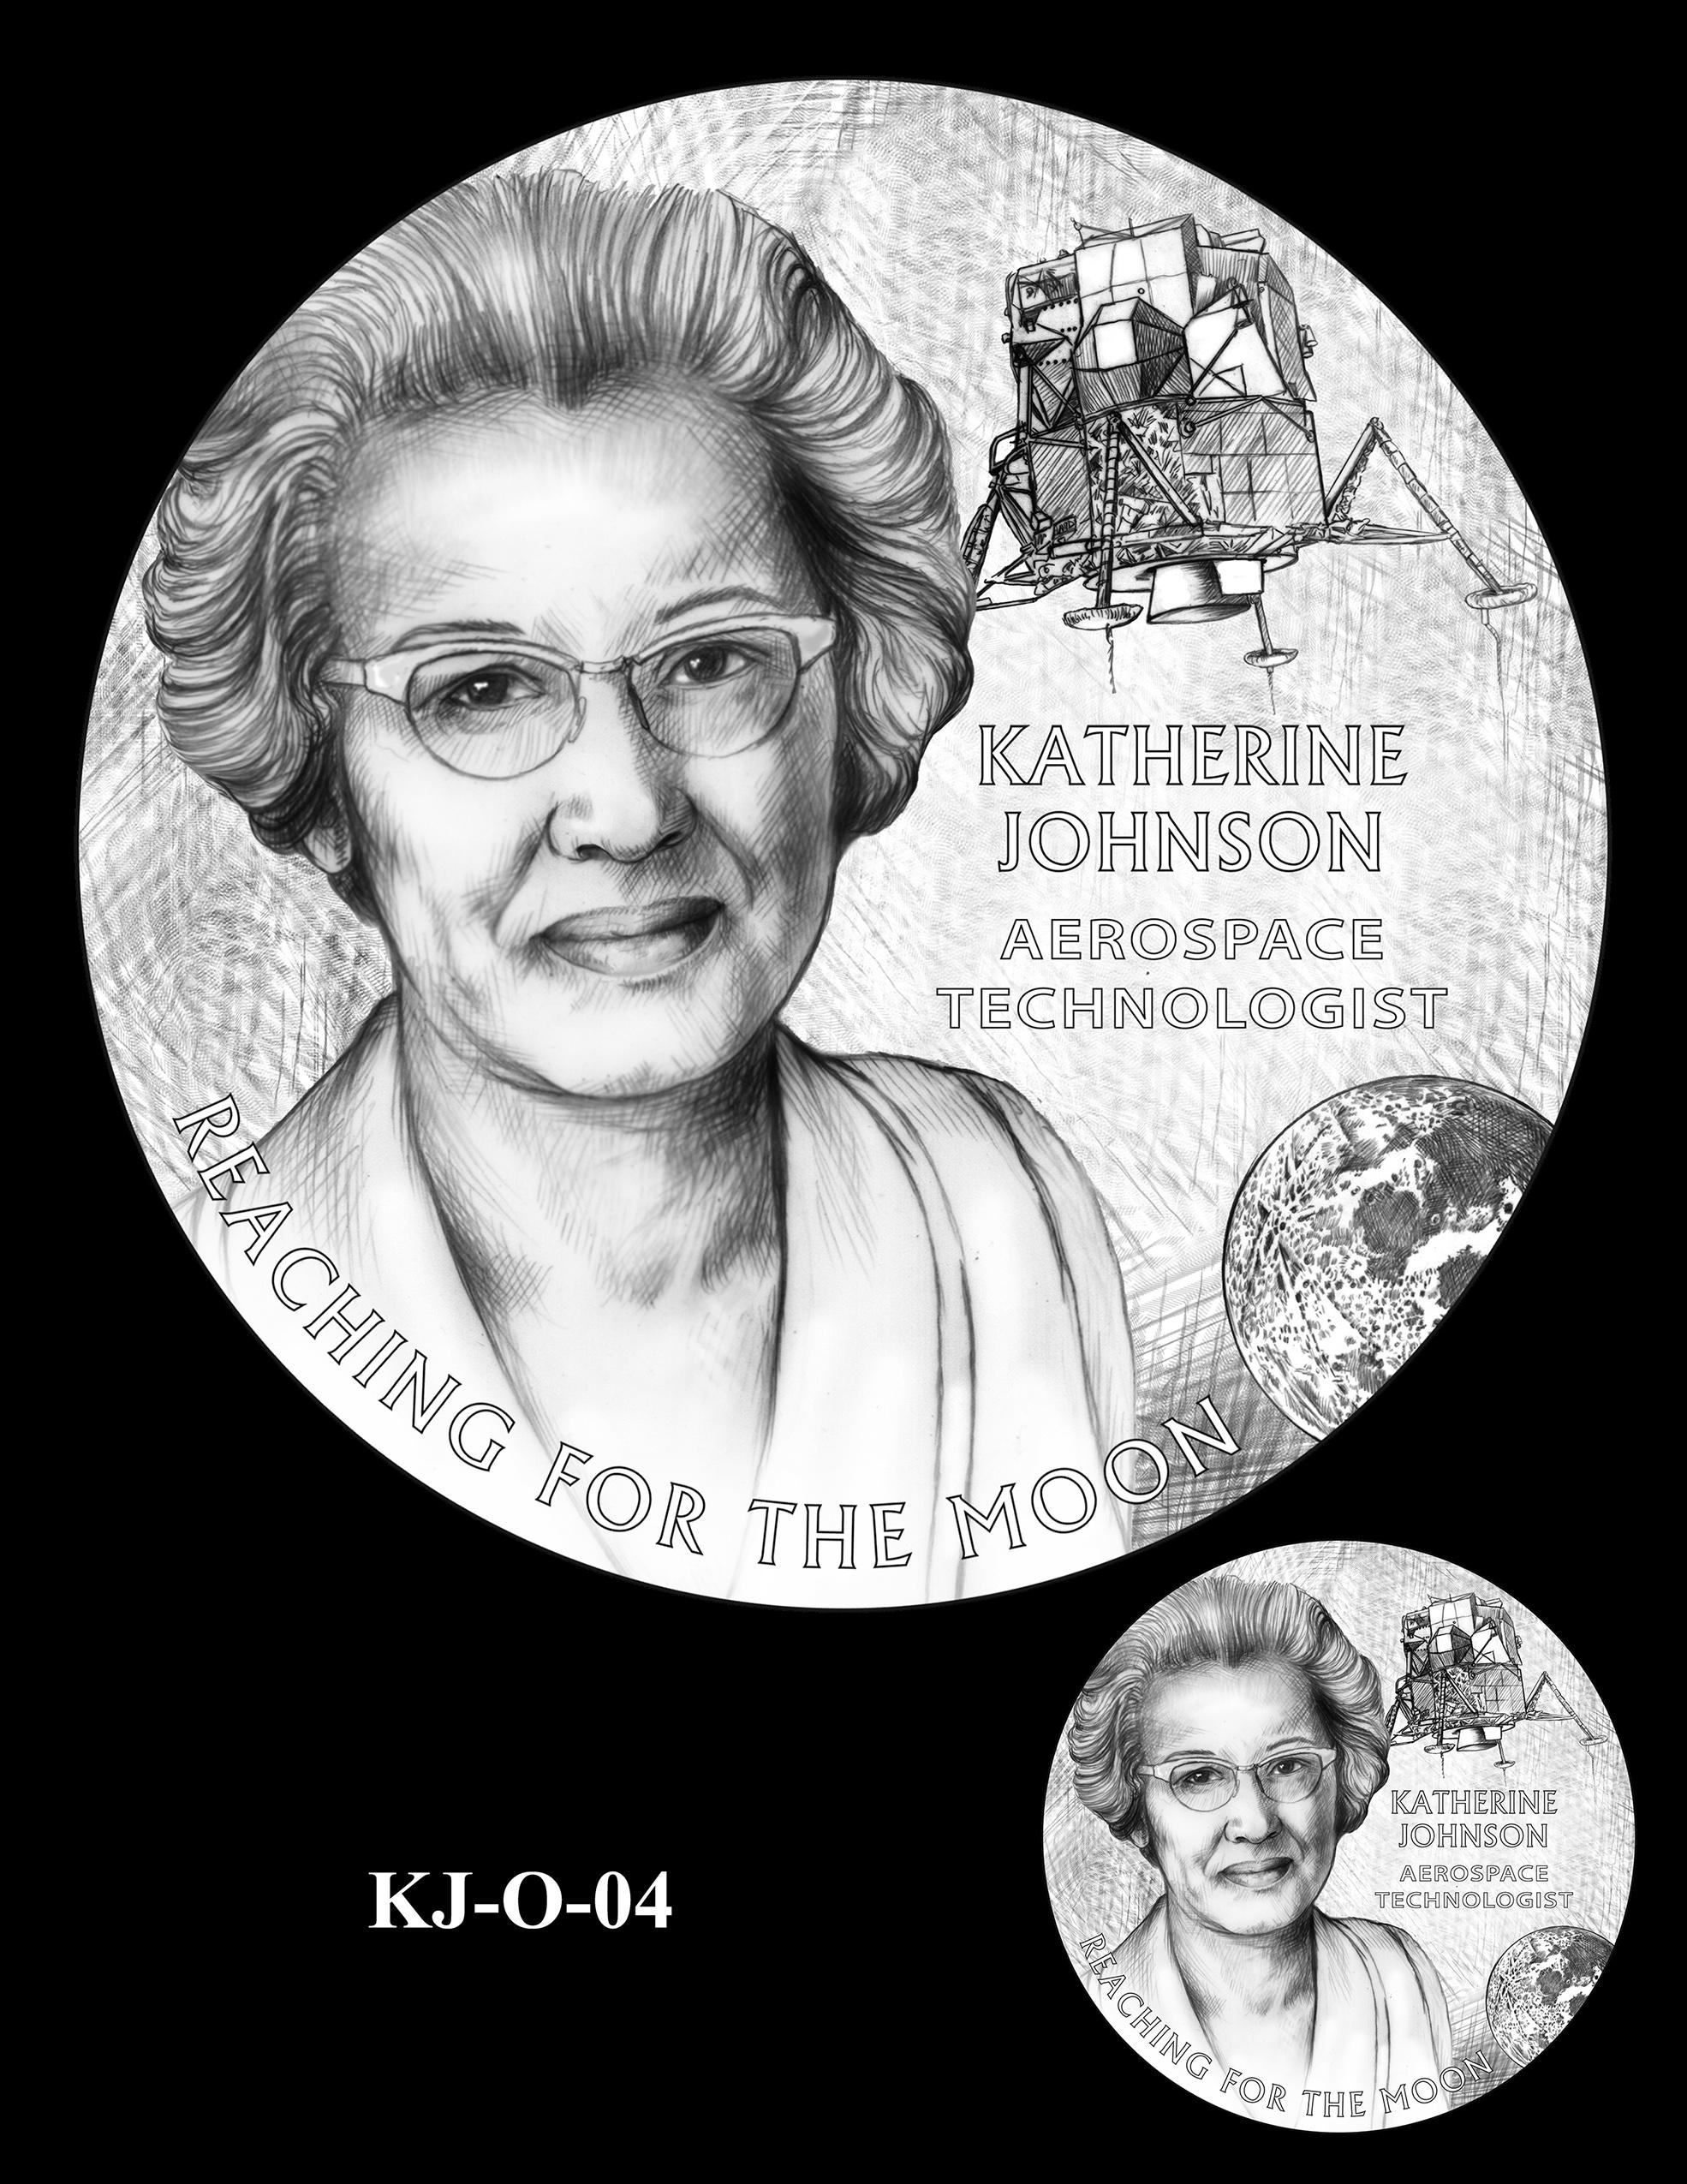 KJ-O-04 -- Katherine Johnson Congressional Gold Medal